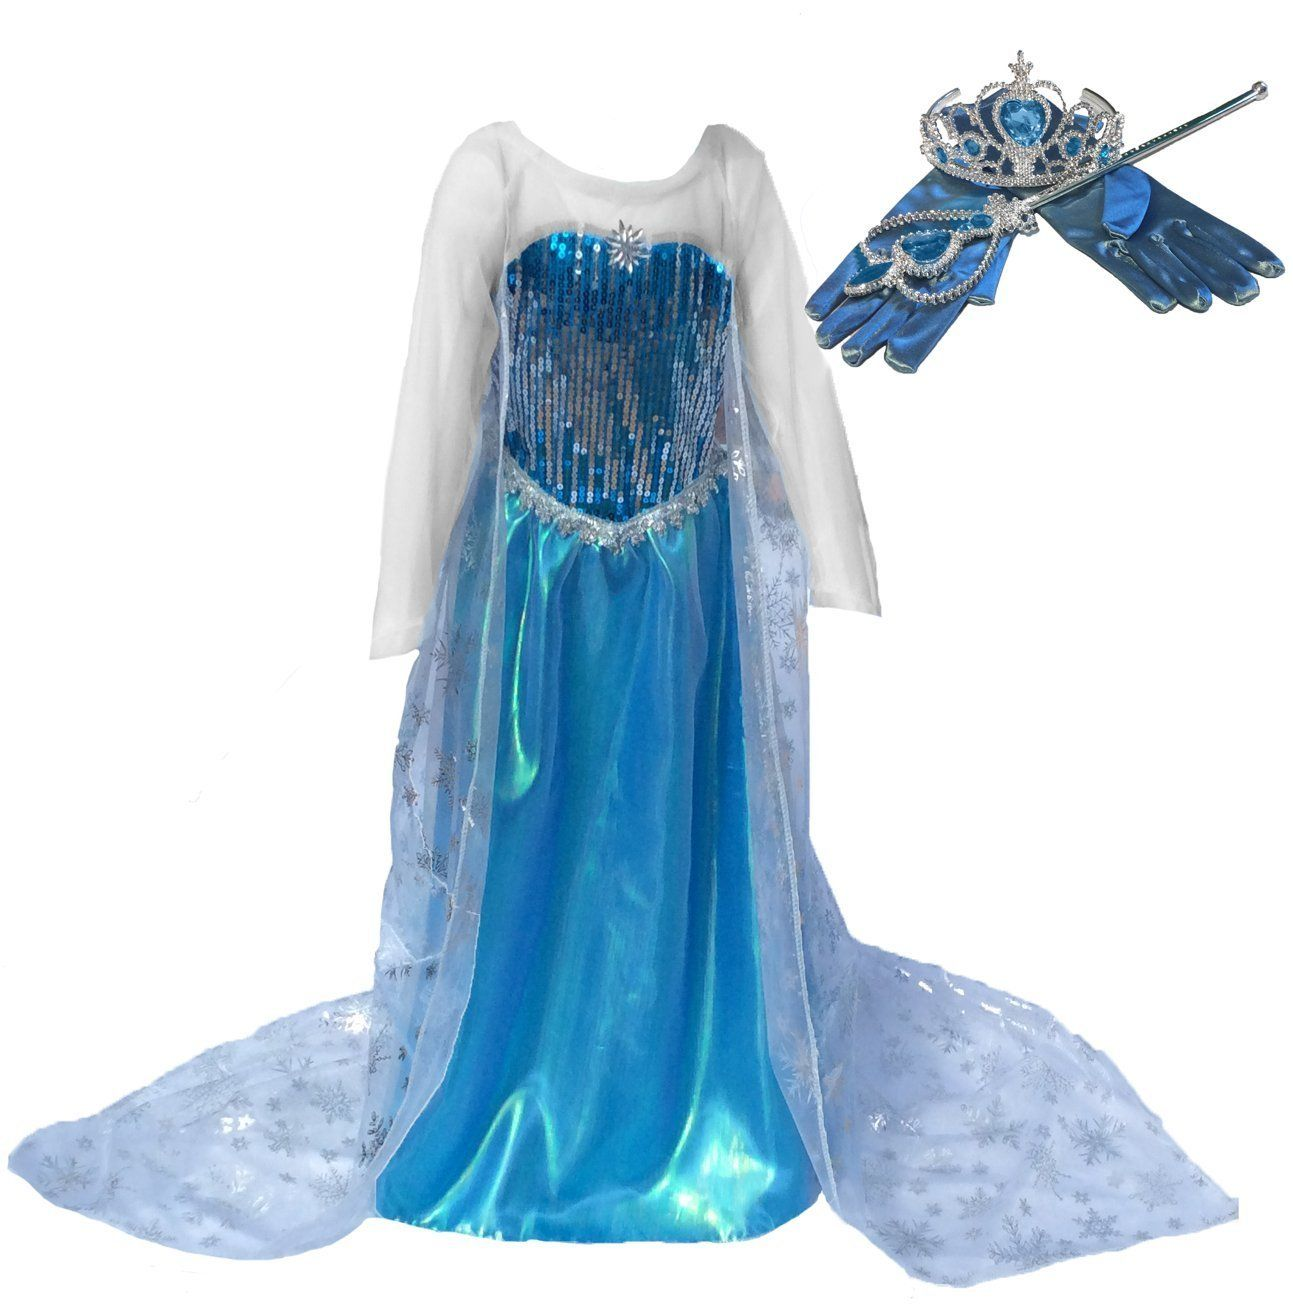 Amazon.com: Ice Princess Long Cape Dress up Set Costume (Ages 11 ...